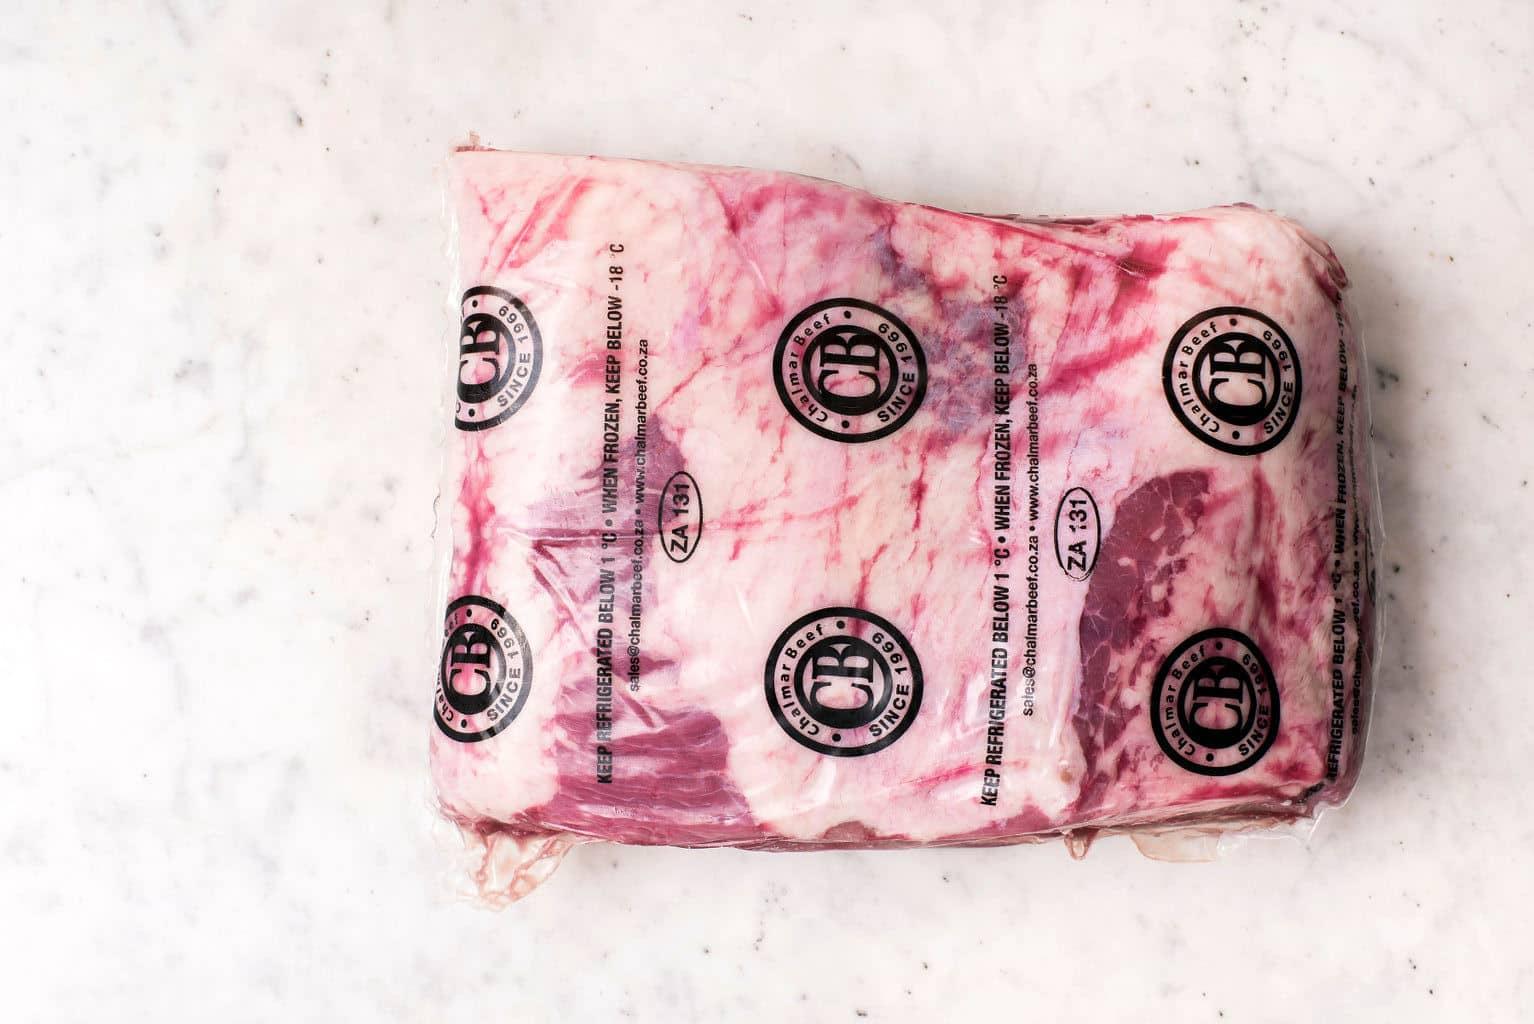 chalmar-beef-boneless-brisket